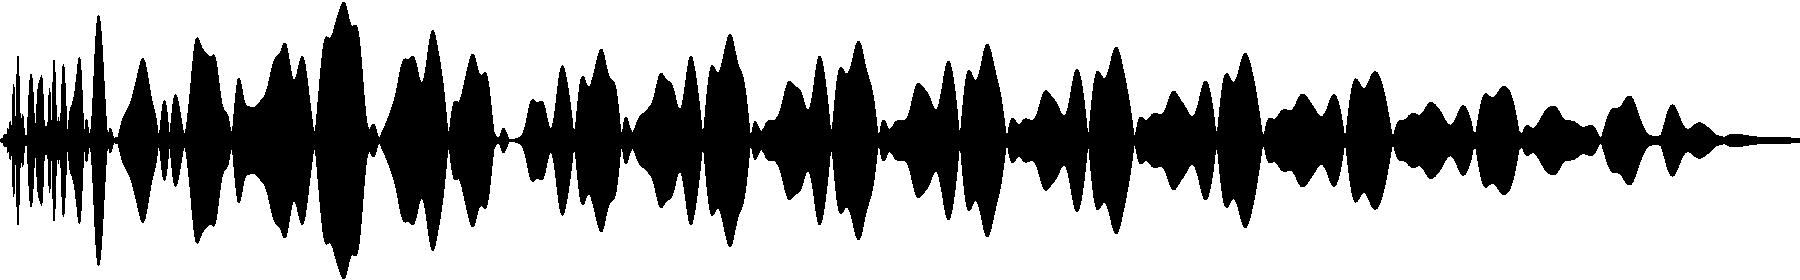 vedh bass cut 059 g